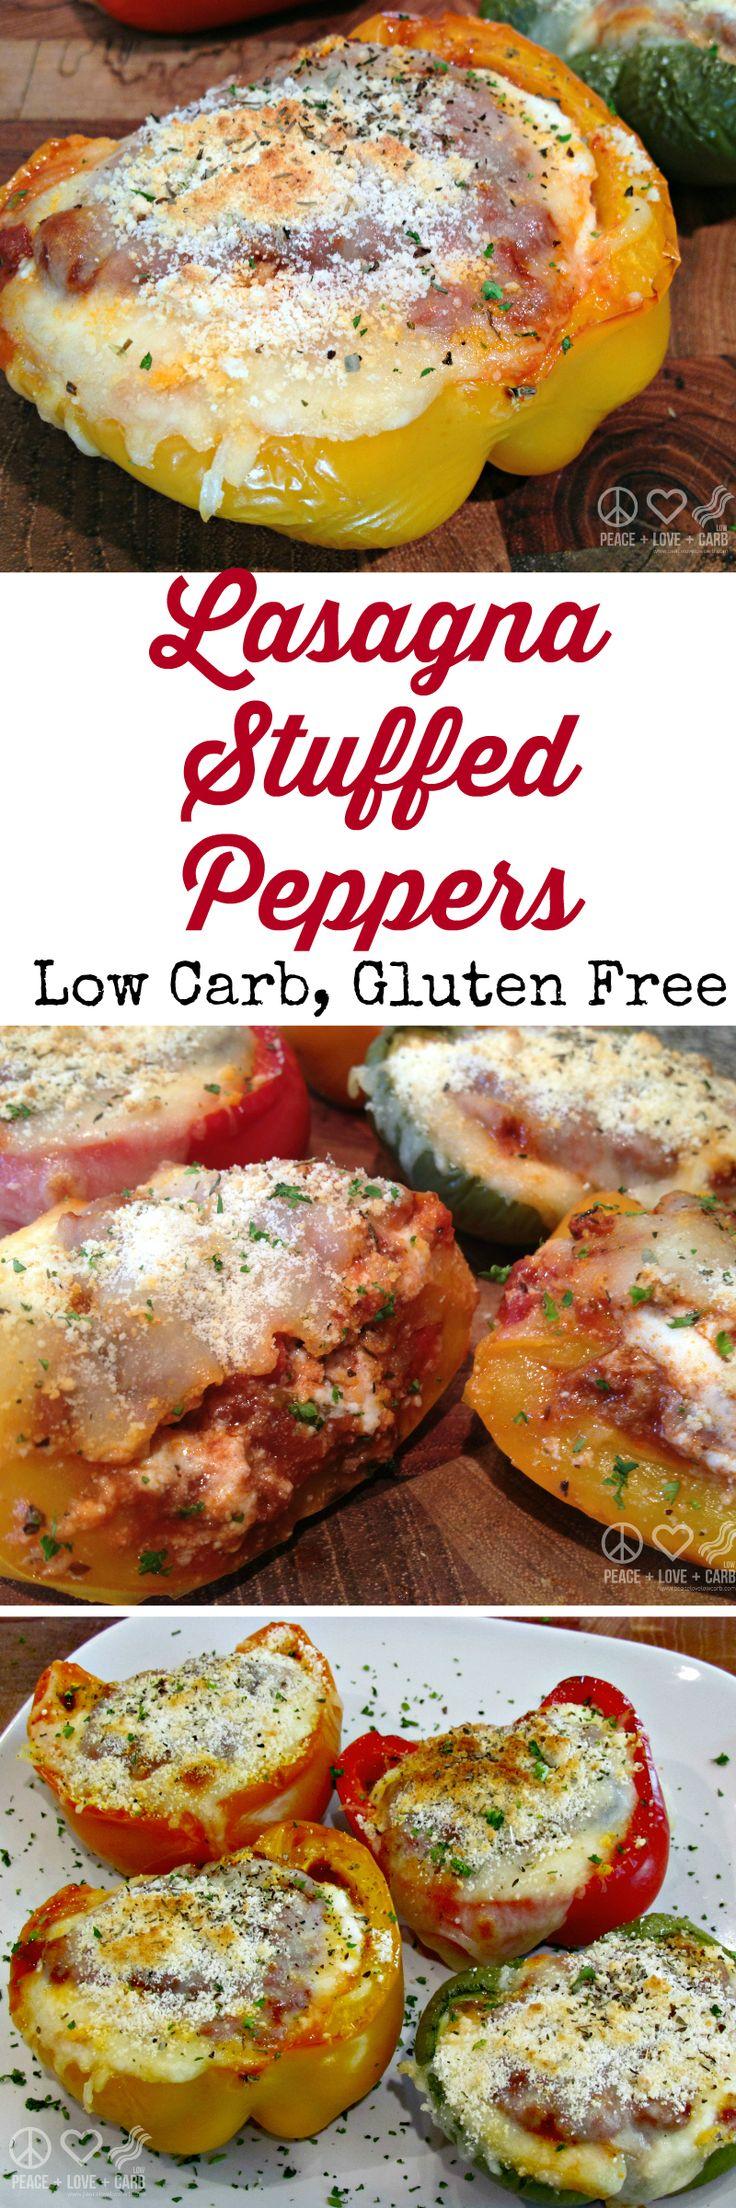 Lasagna Stuffed Peppers #lowcarb